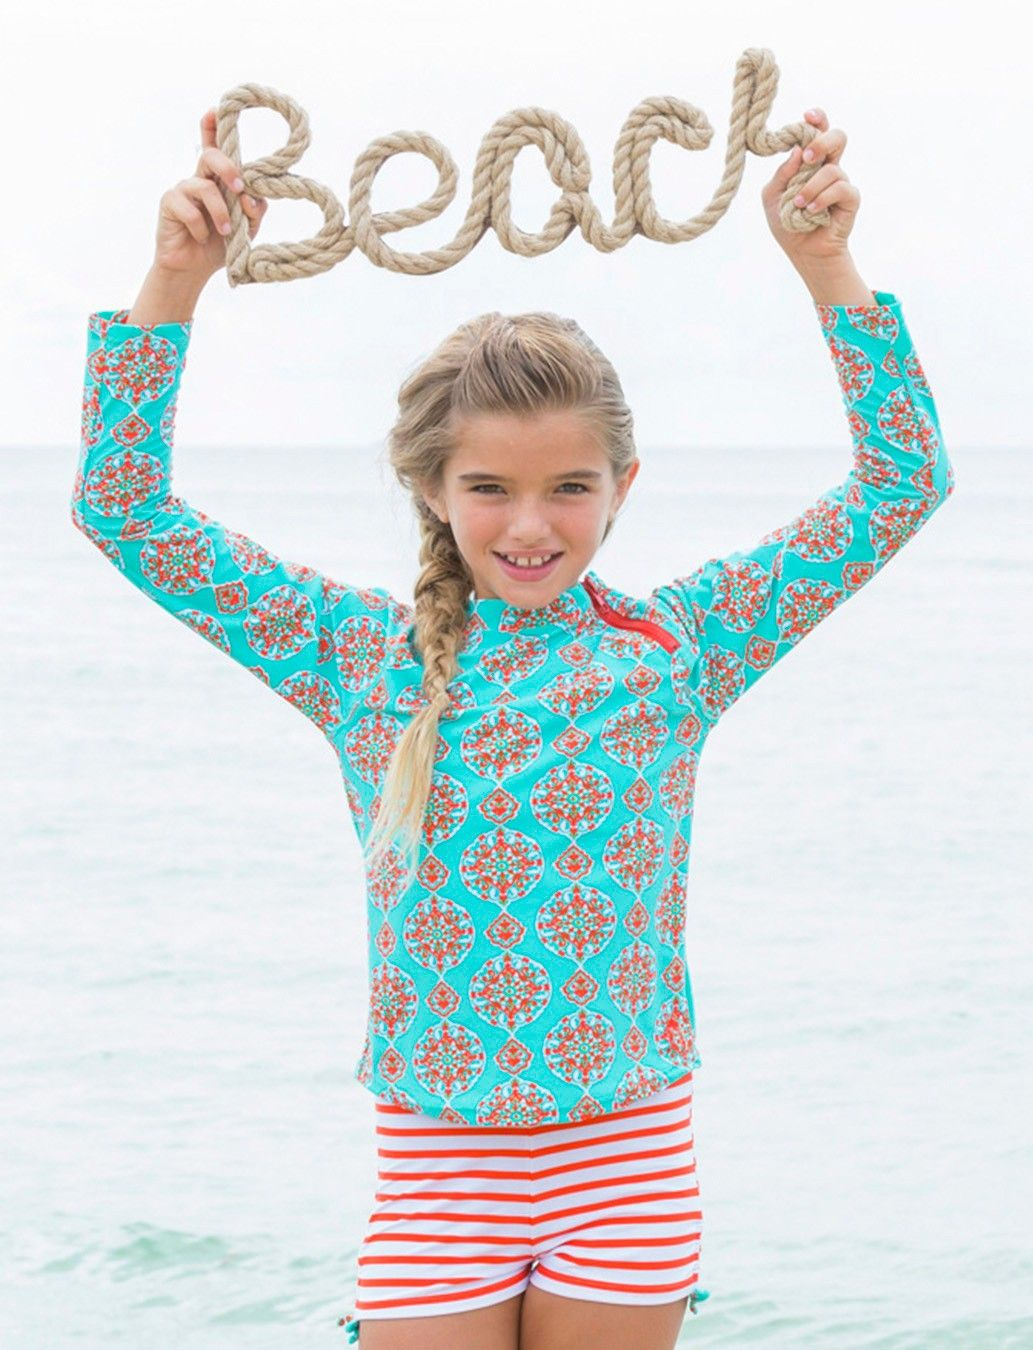 f718c7e5b0 Cabana Life Girls Turquoise Printed Rashguard with Triangle Bikini Top and  Striped Boy Style Swim Bottoms - 50+ UV Protection